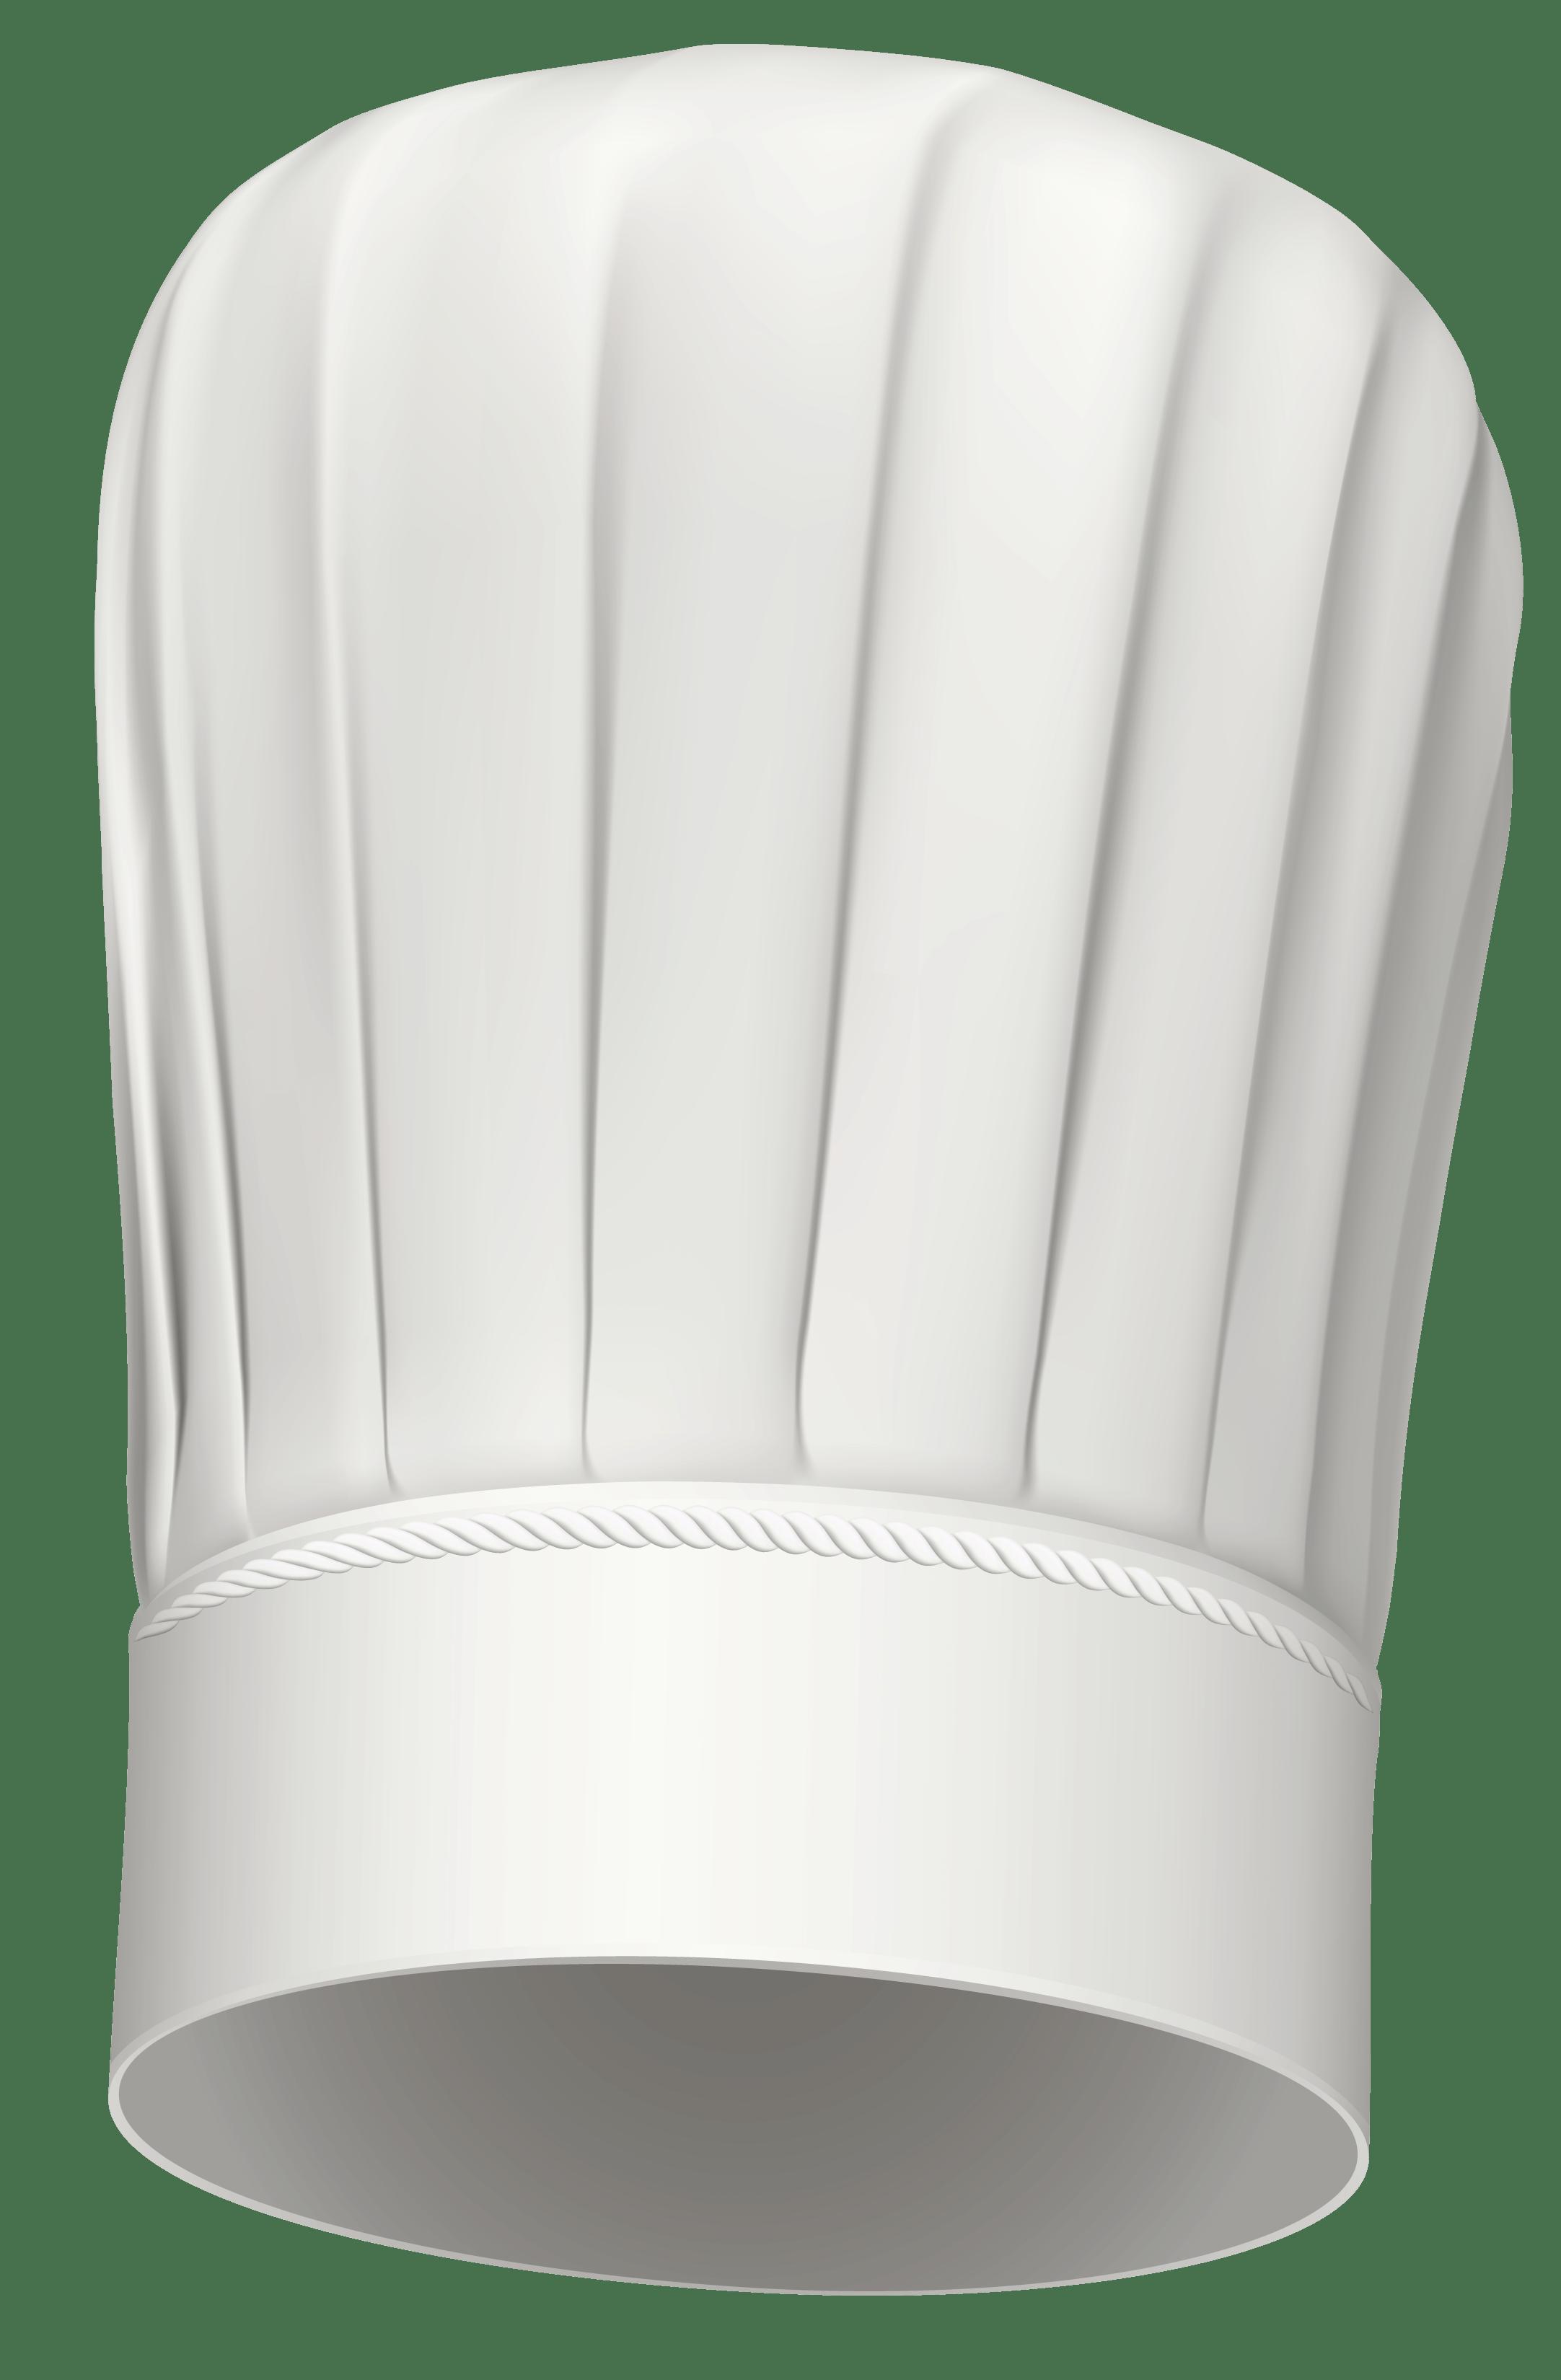 Chef Hat transparent PNG.